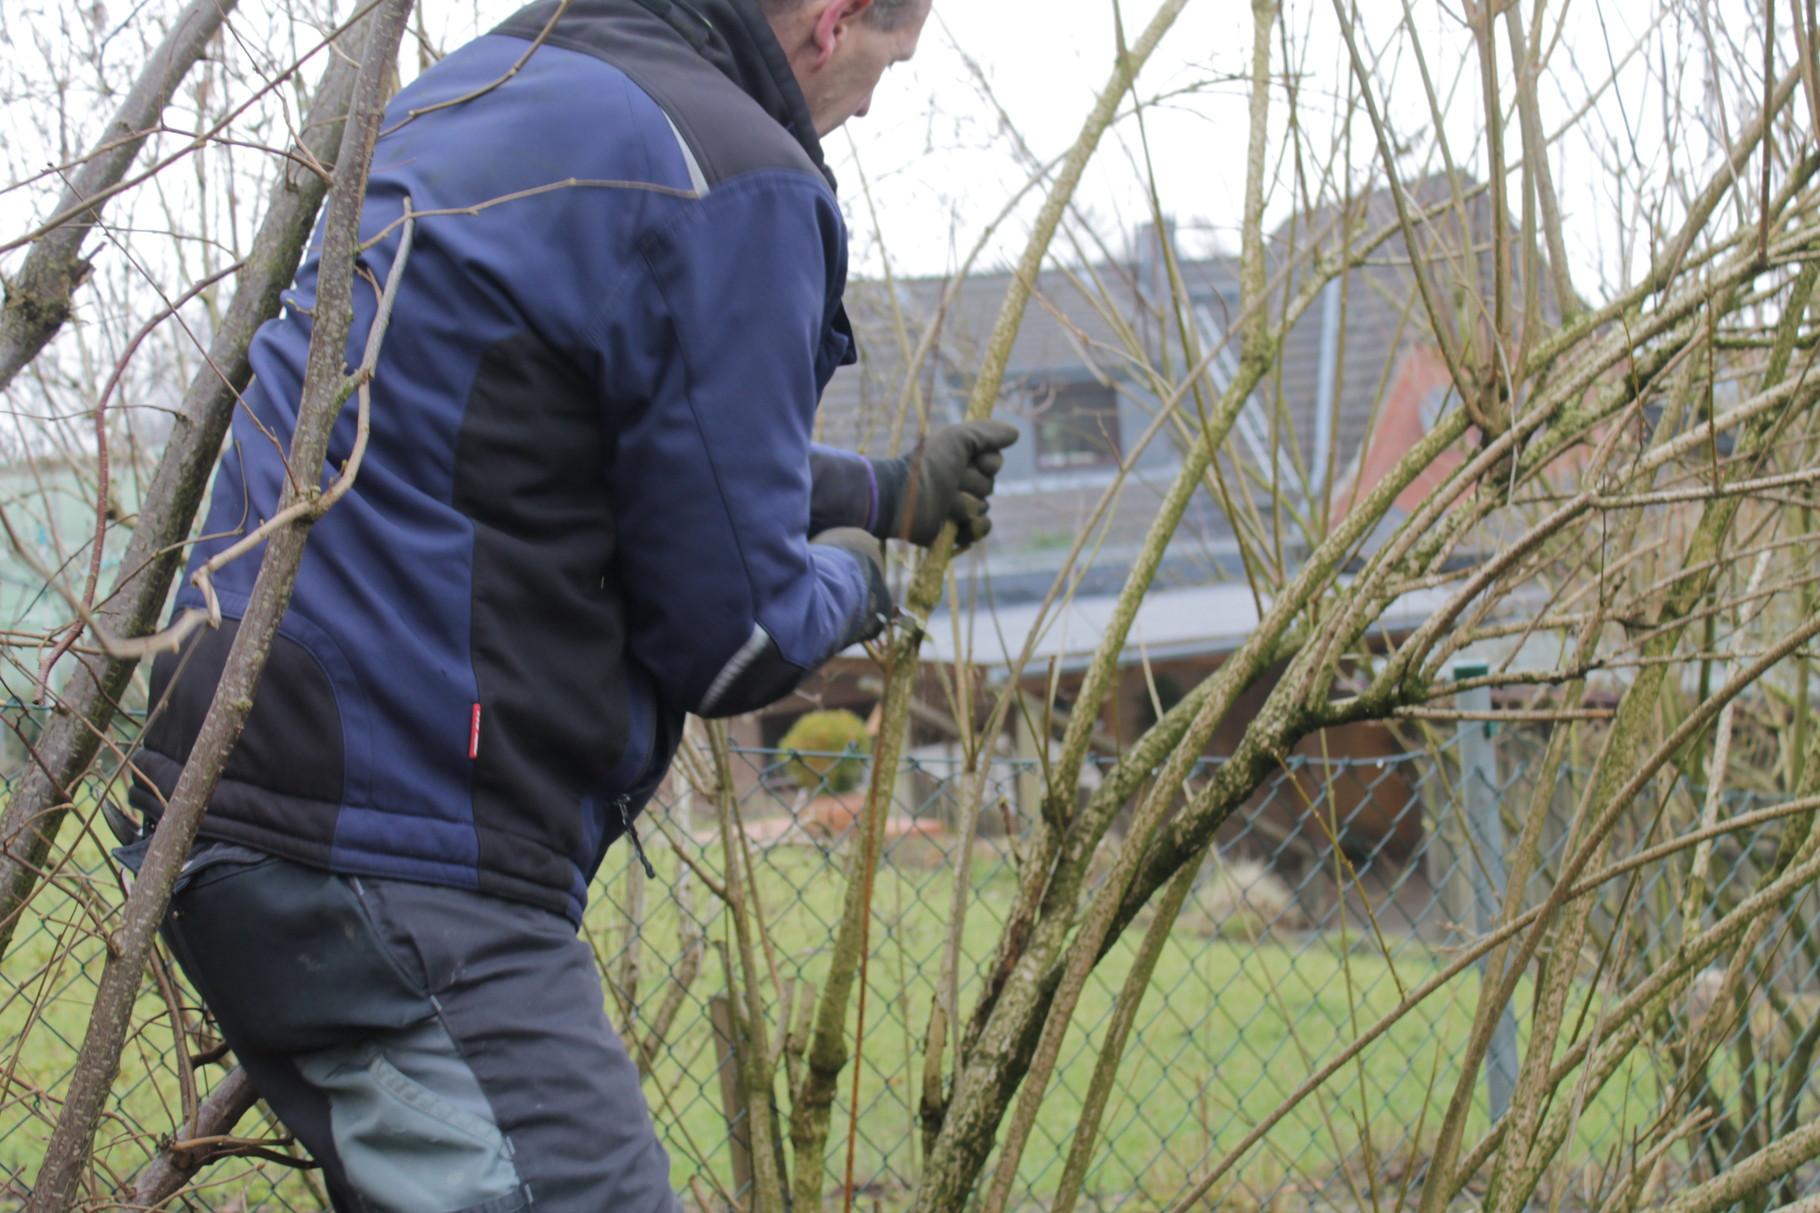 Zuviel Altholz fordert den starken Rückschnitt der Forsythie